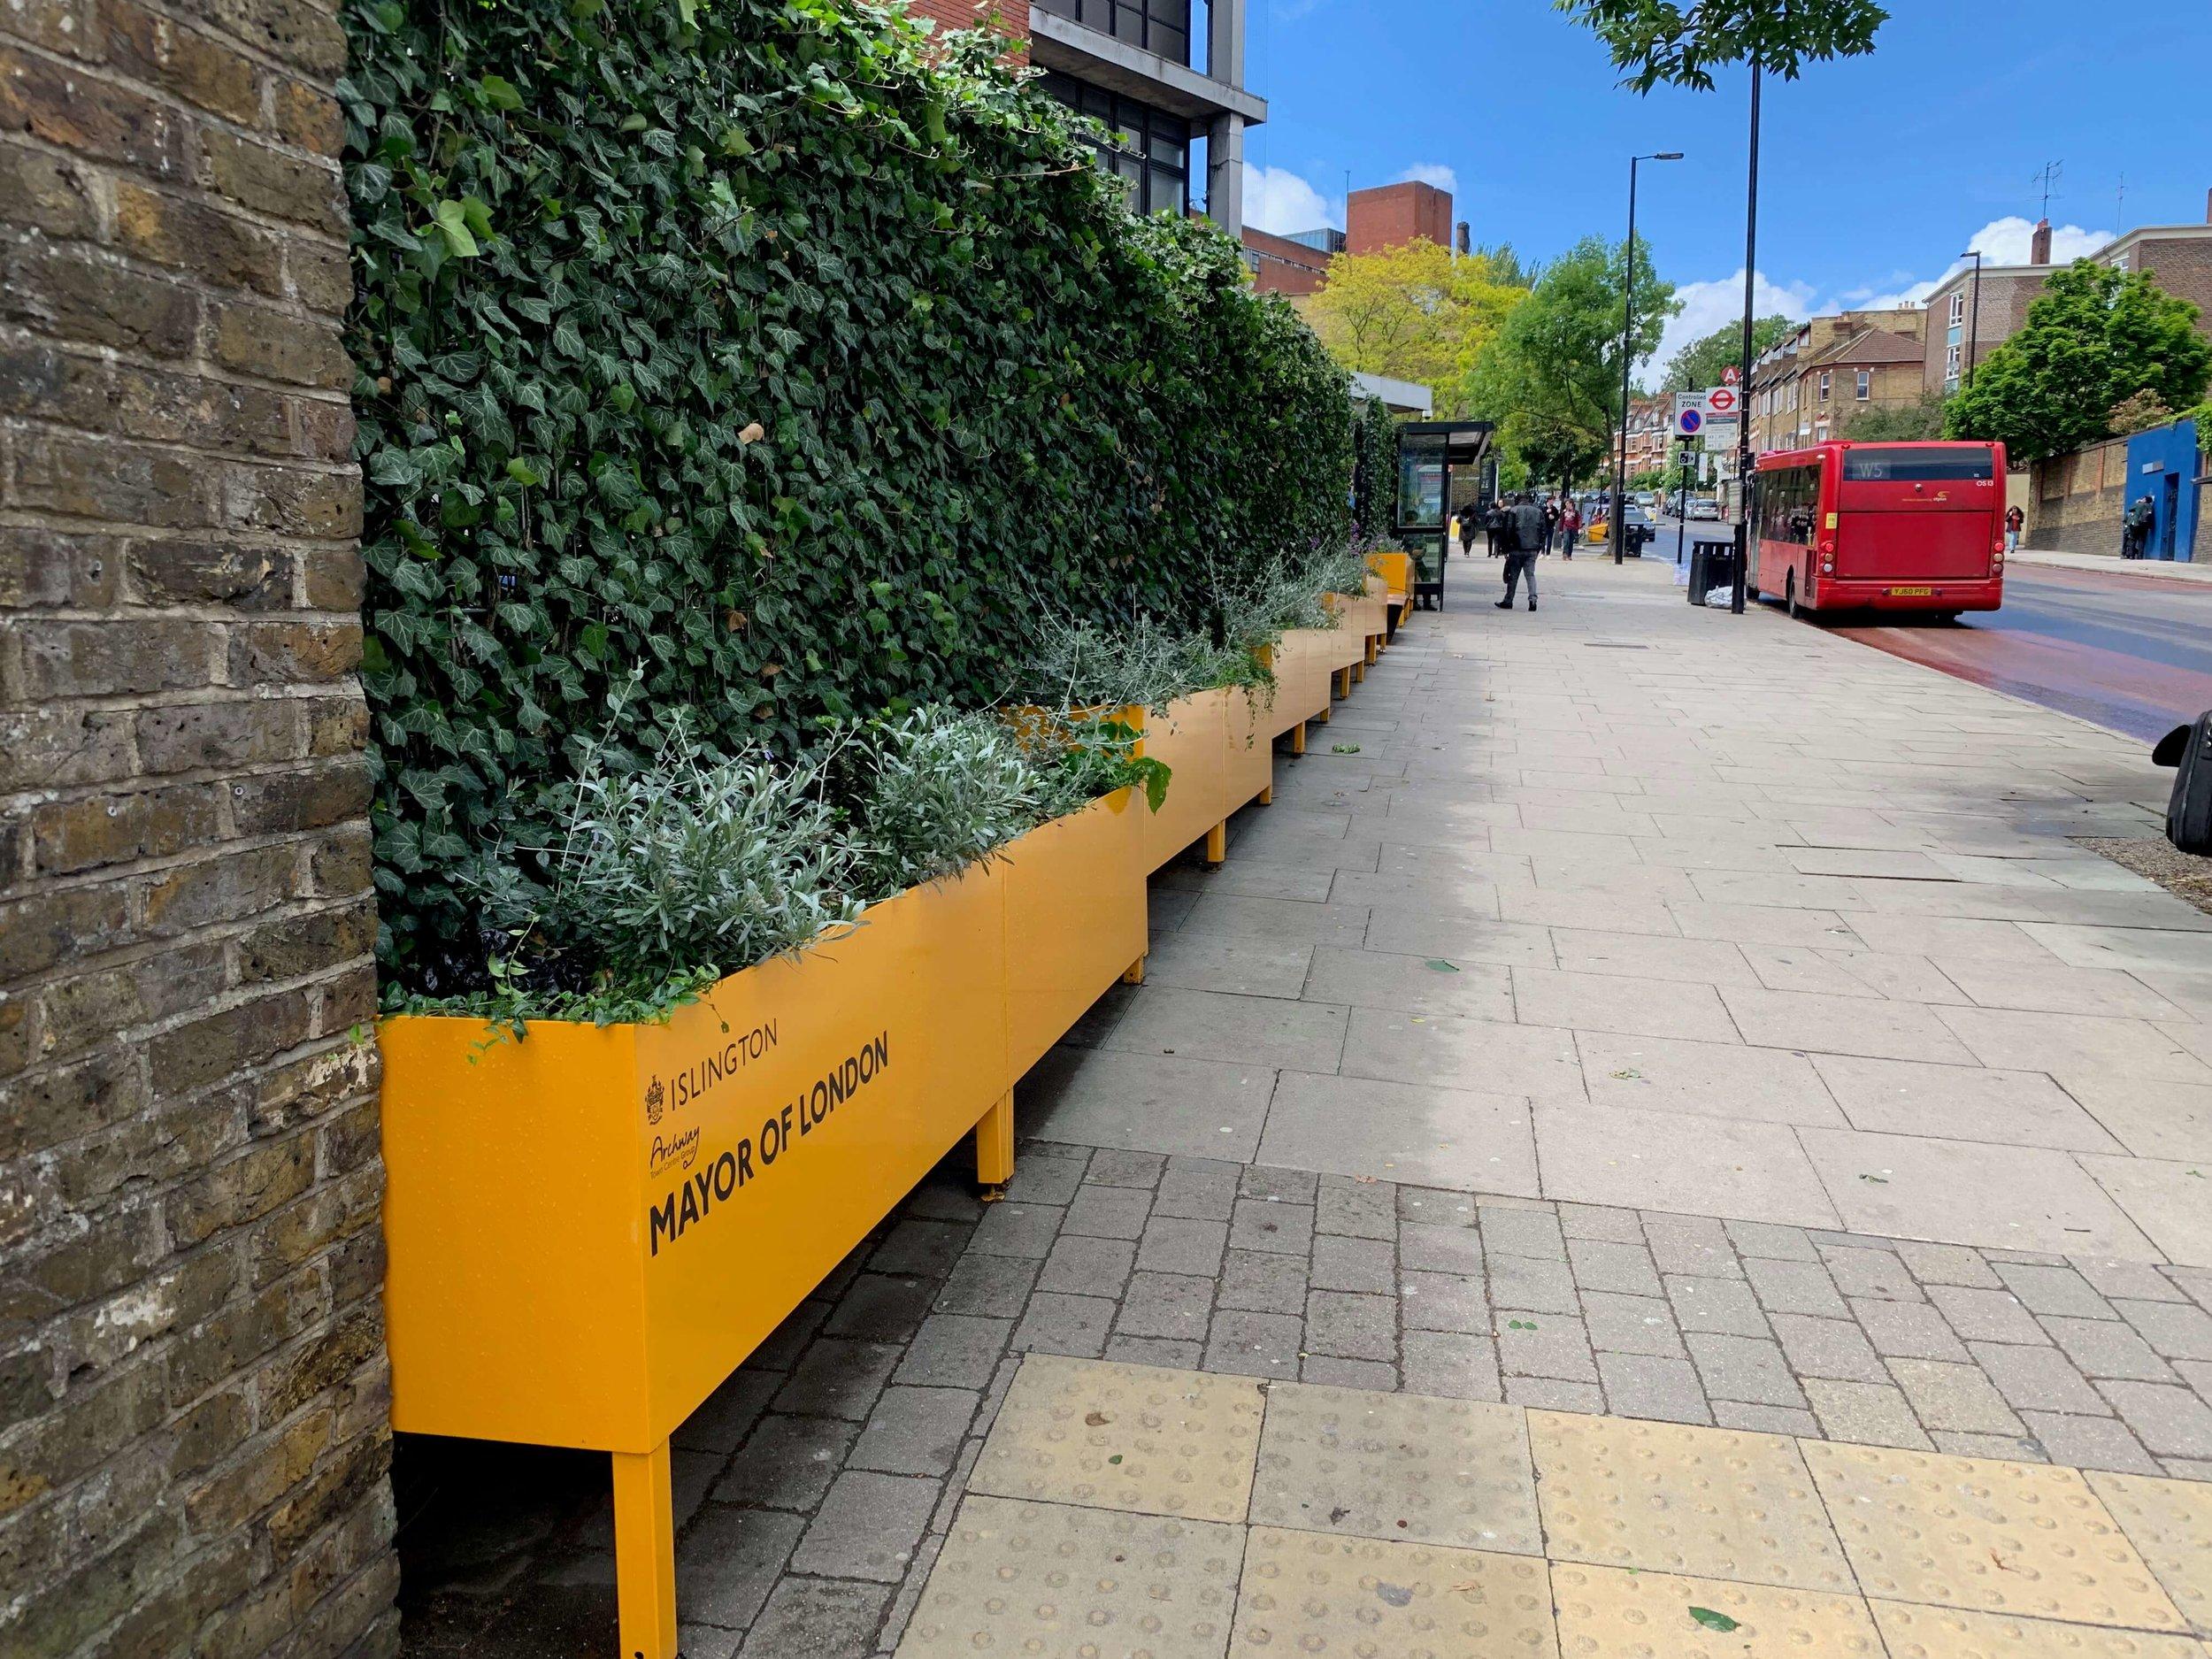 Whittington Street hospital green screens